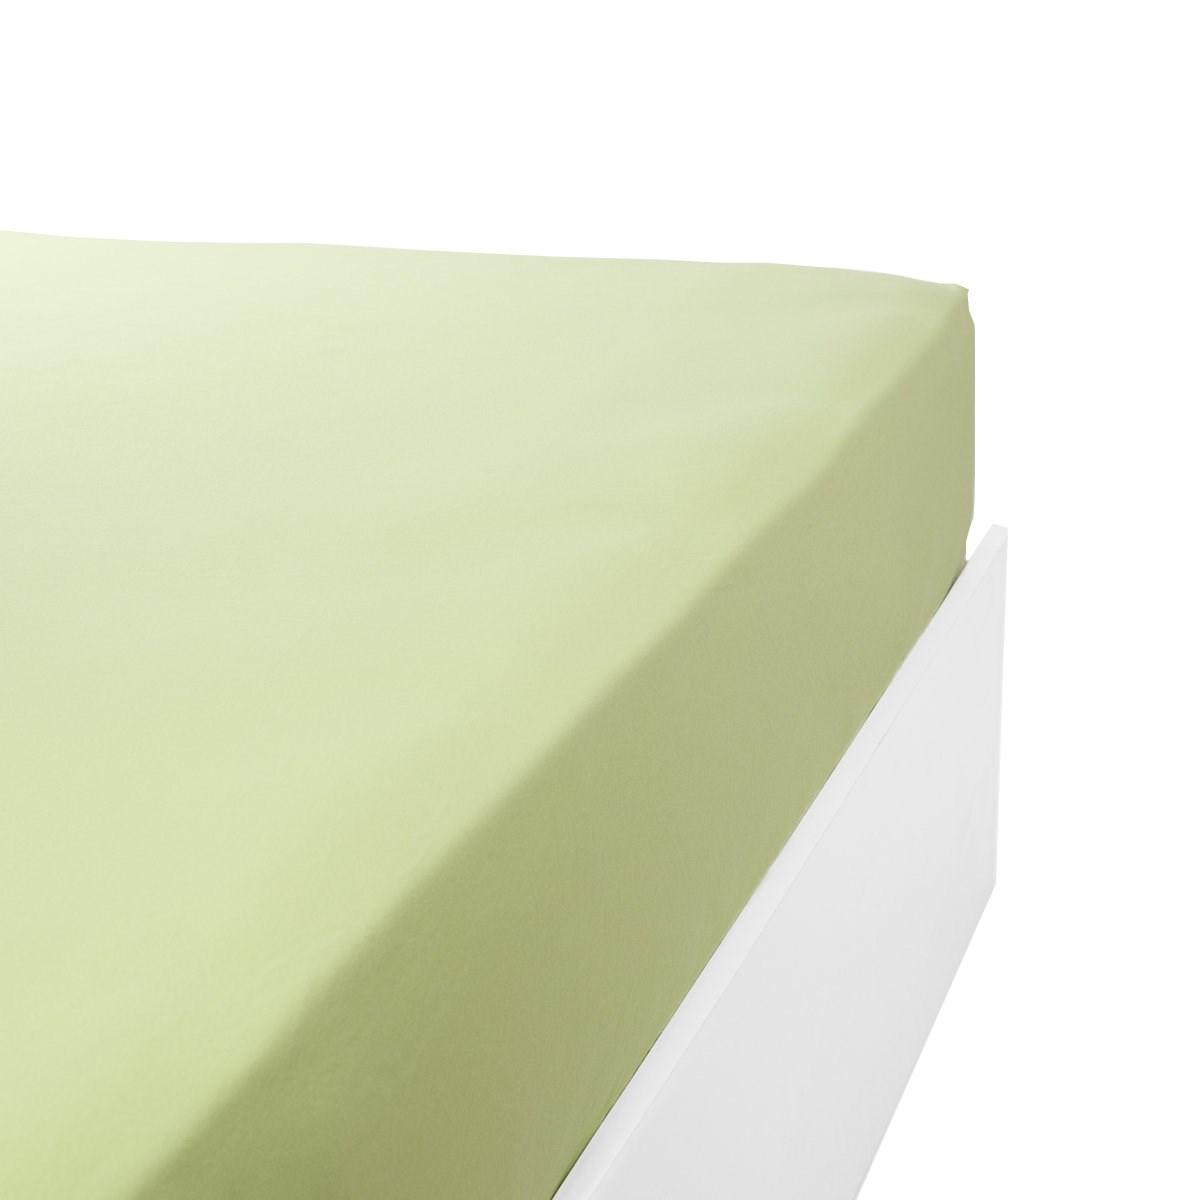 Drap housse flanelle en Molleton Vert anis 180x200 cm